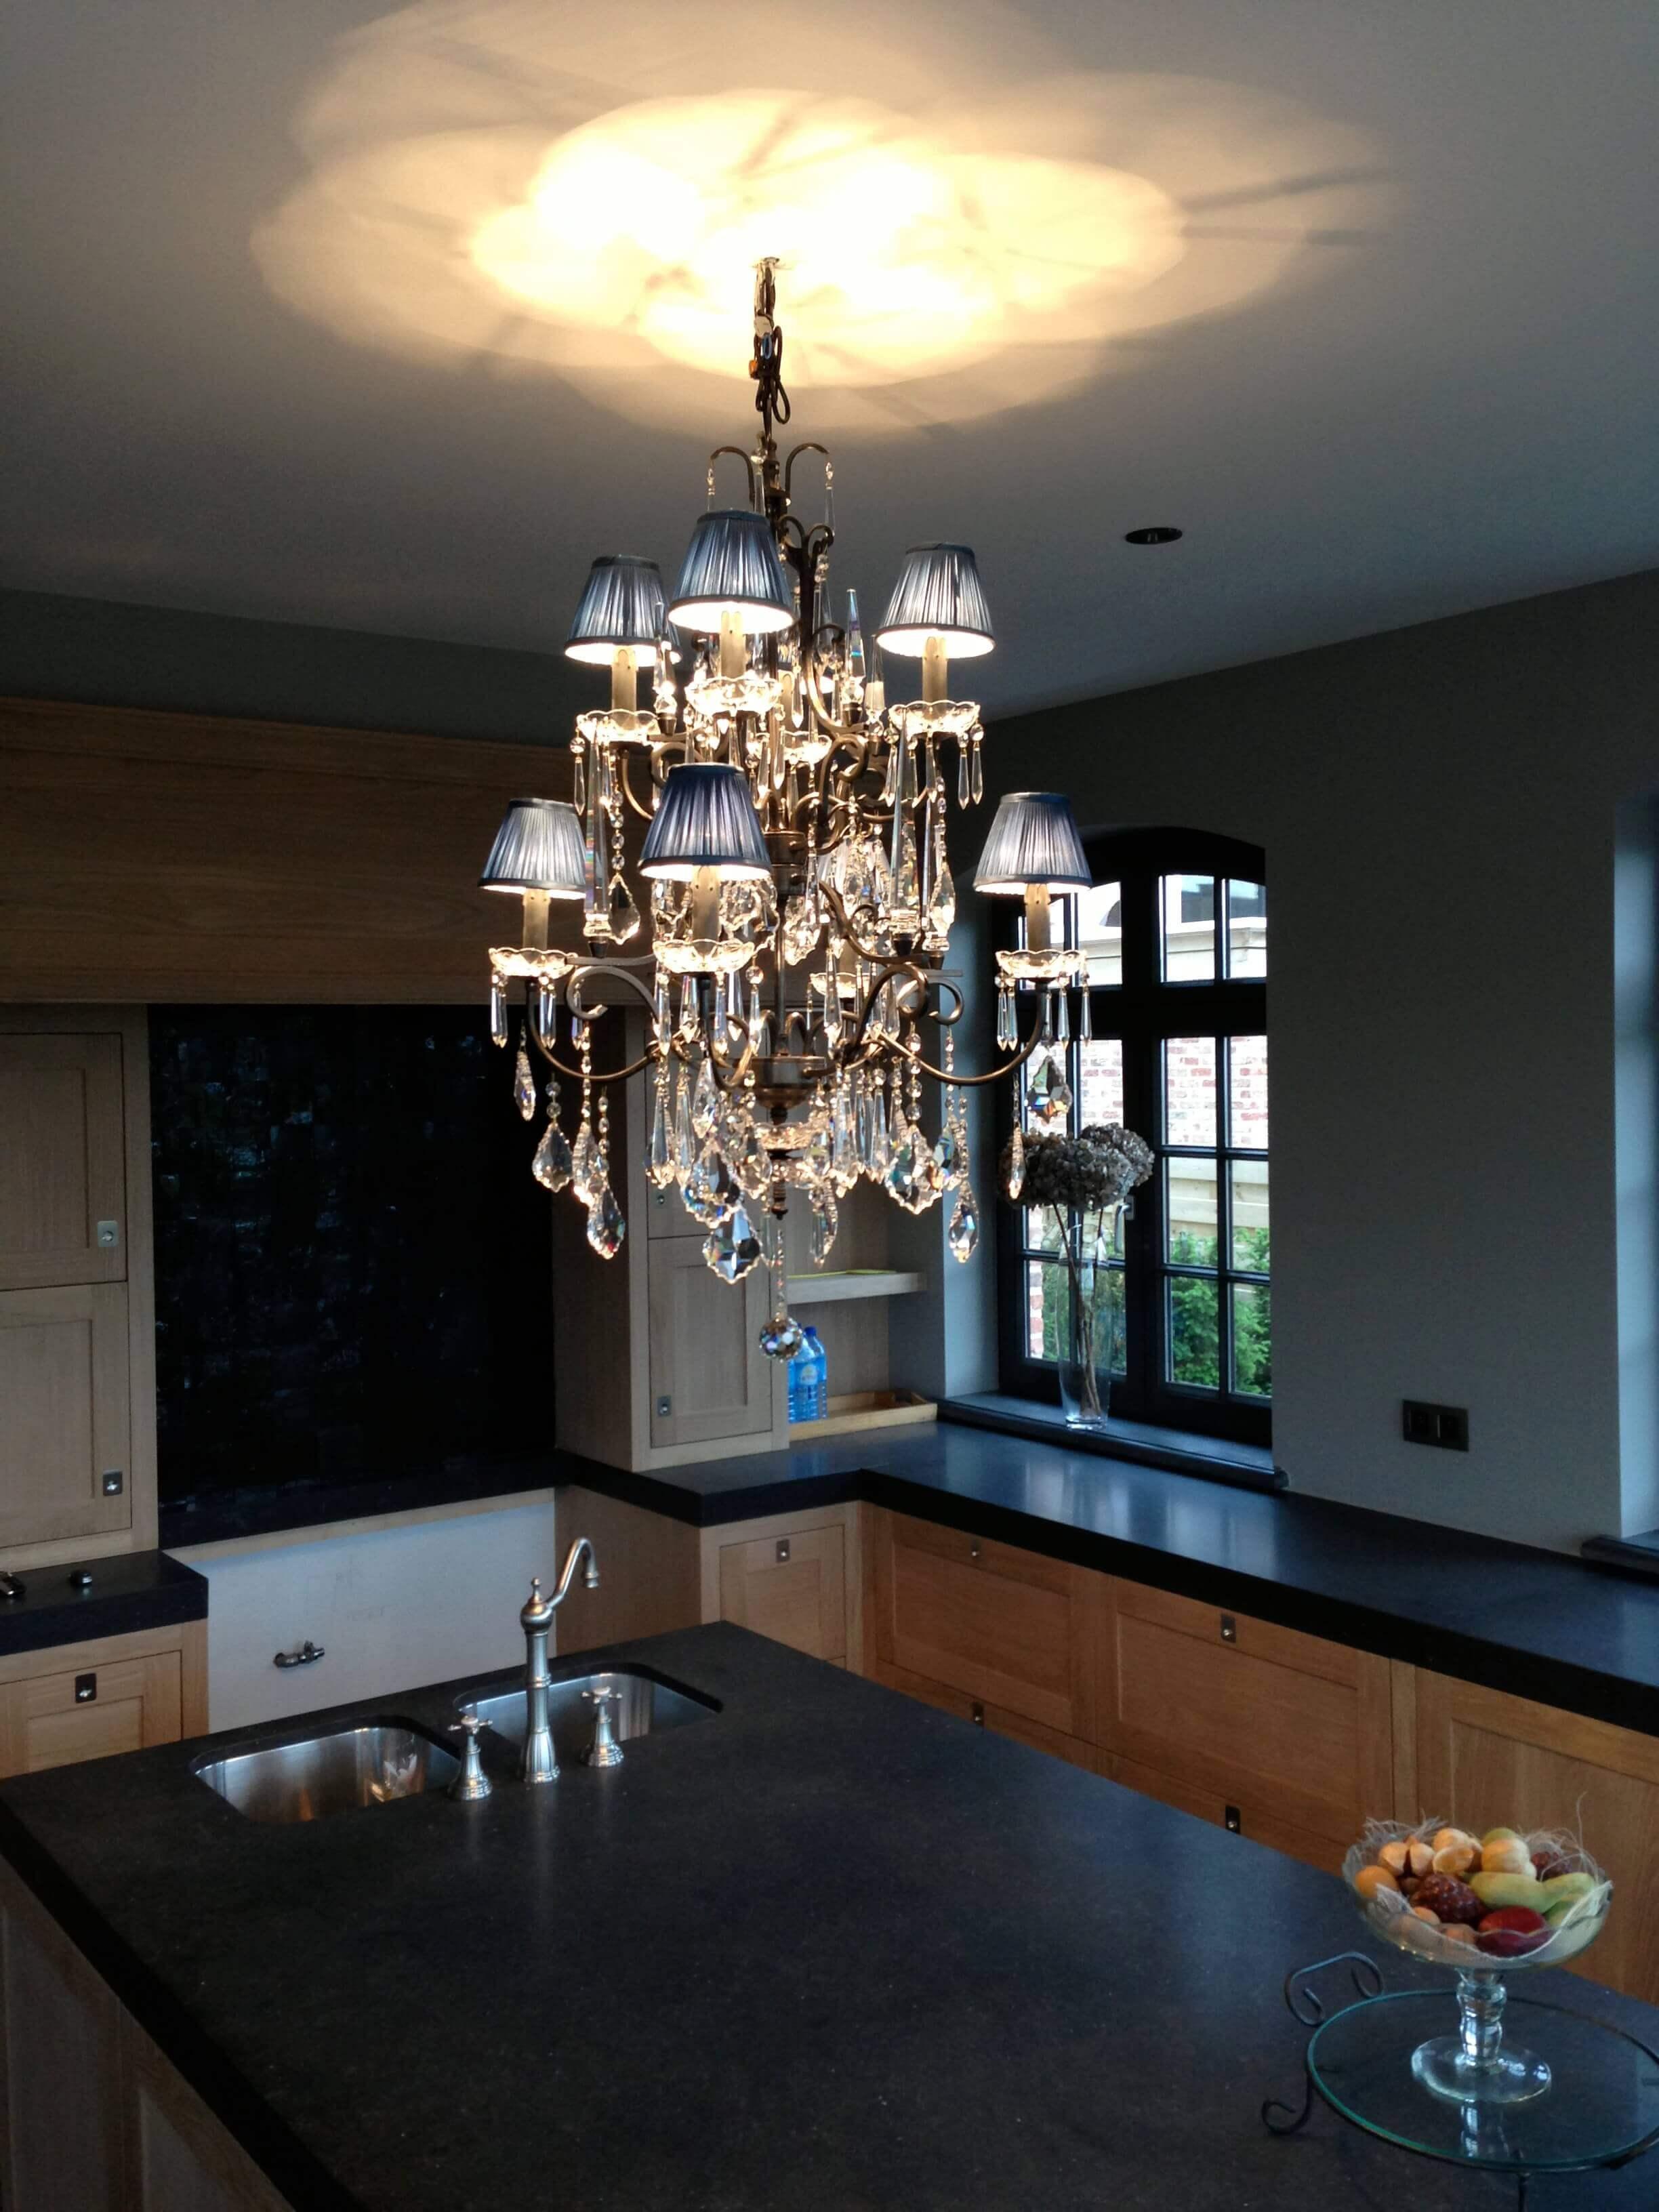 Badkamer en keuken I Asse - MVL verlichting